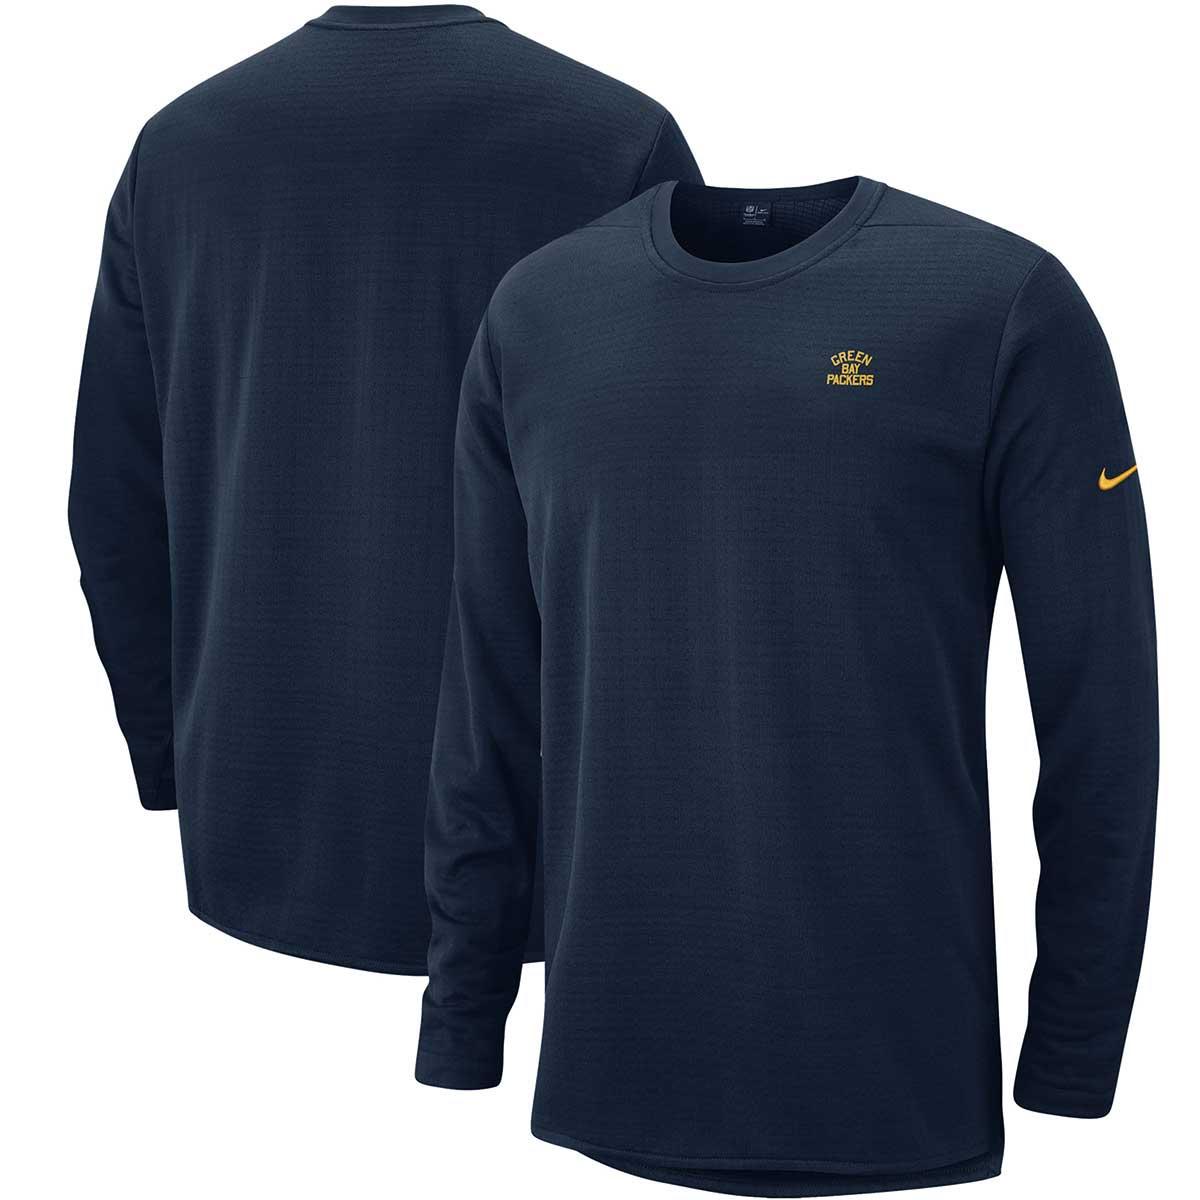 Green Bay Packers Nike Sideline Modern Alternate Throwback Logo Performance Sweatshirt - Navy